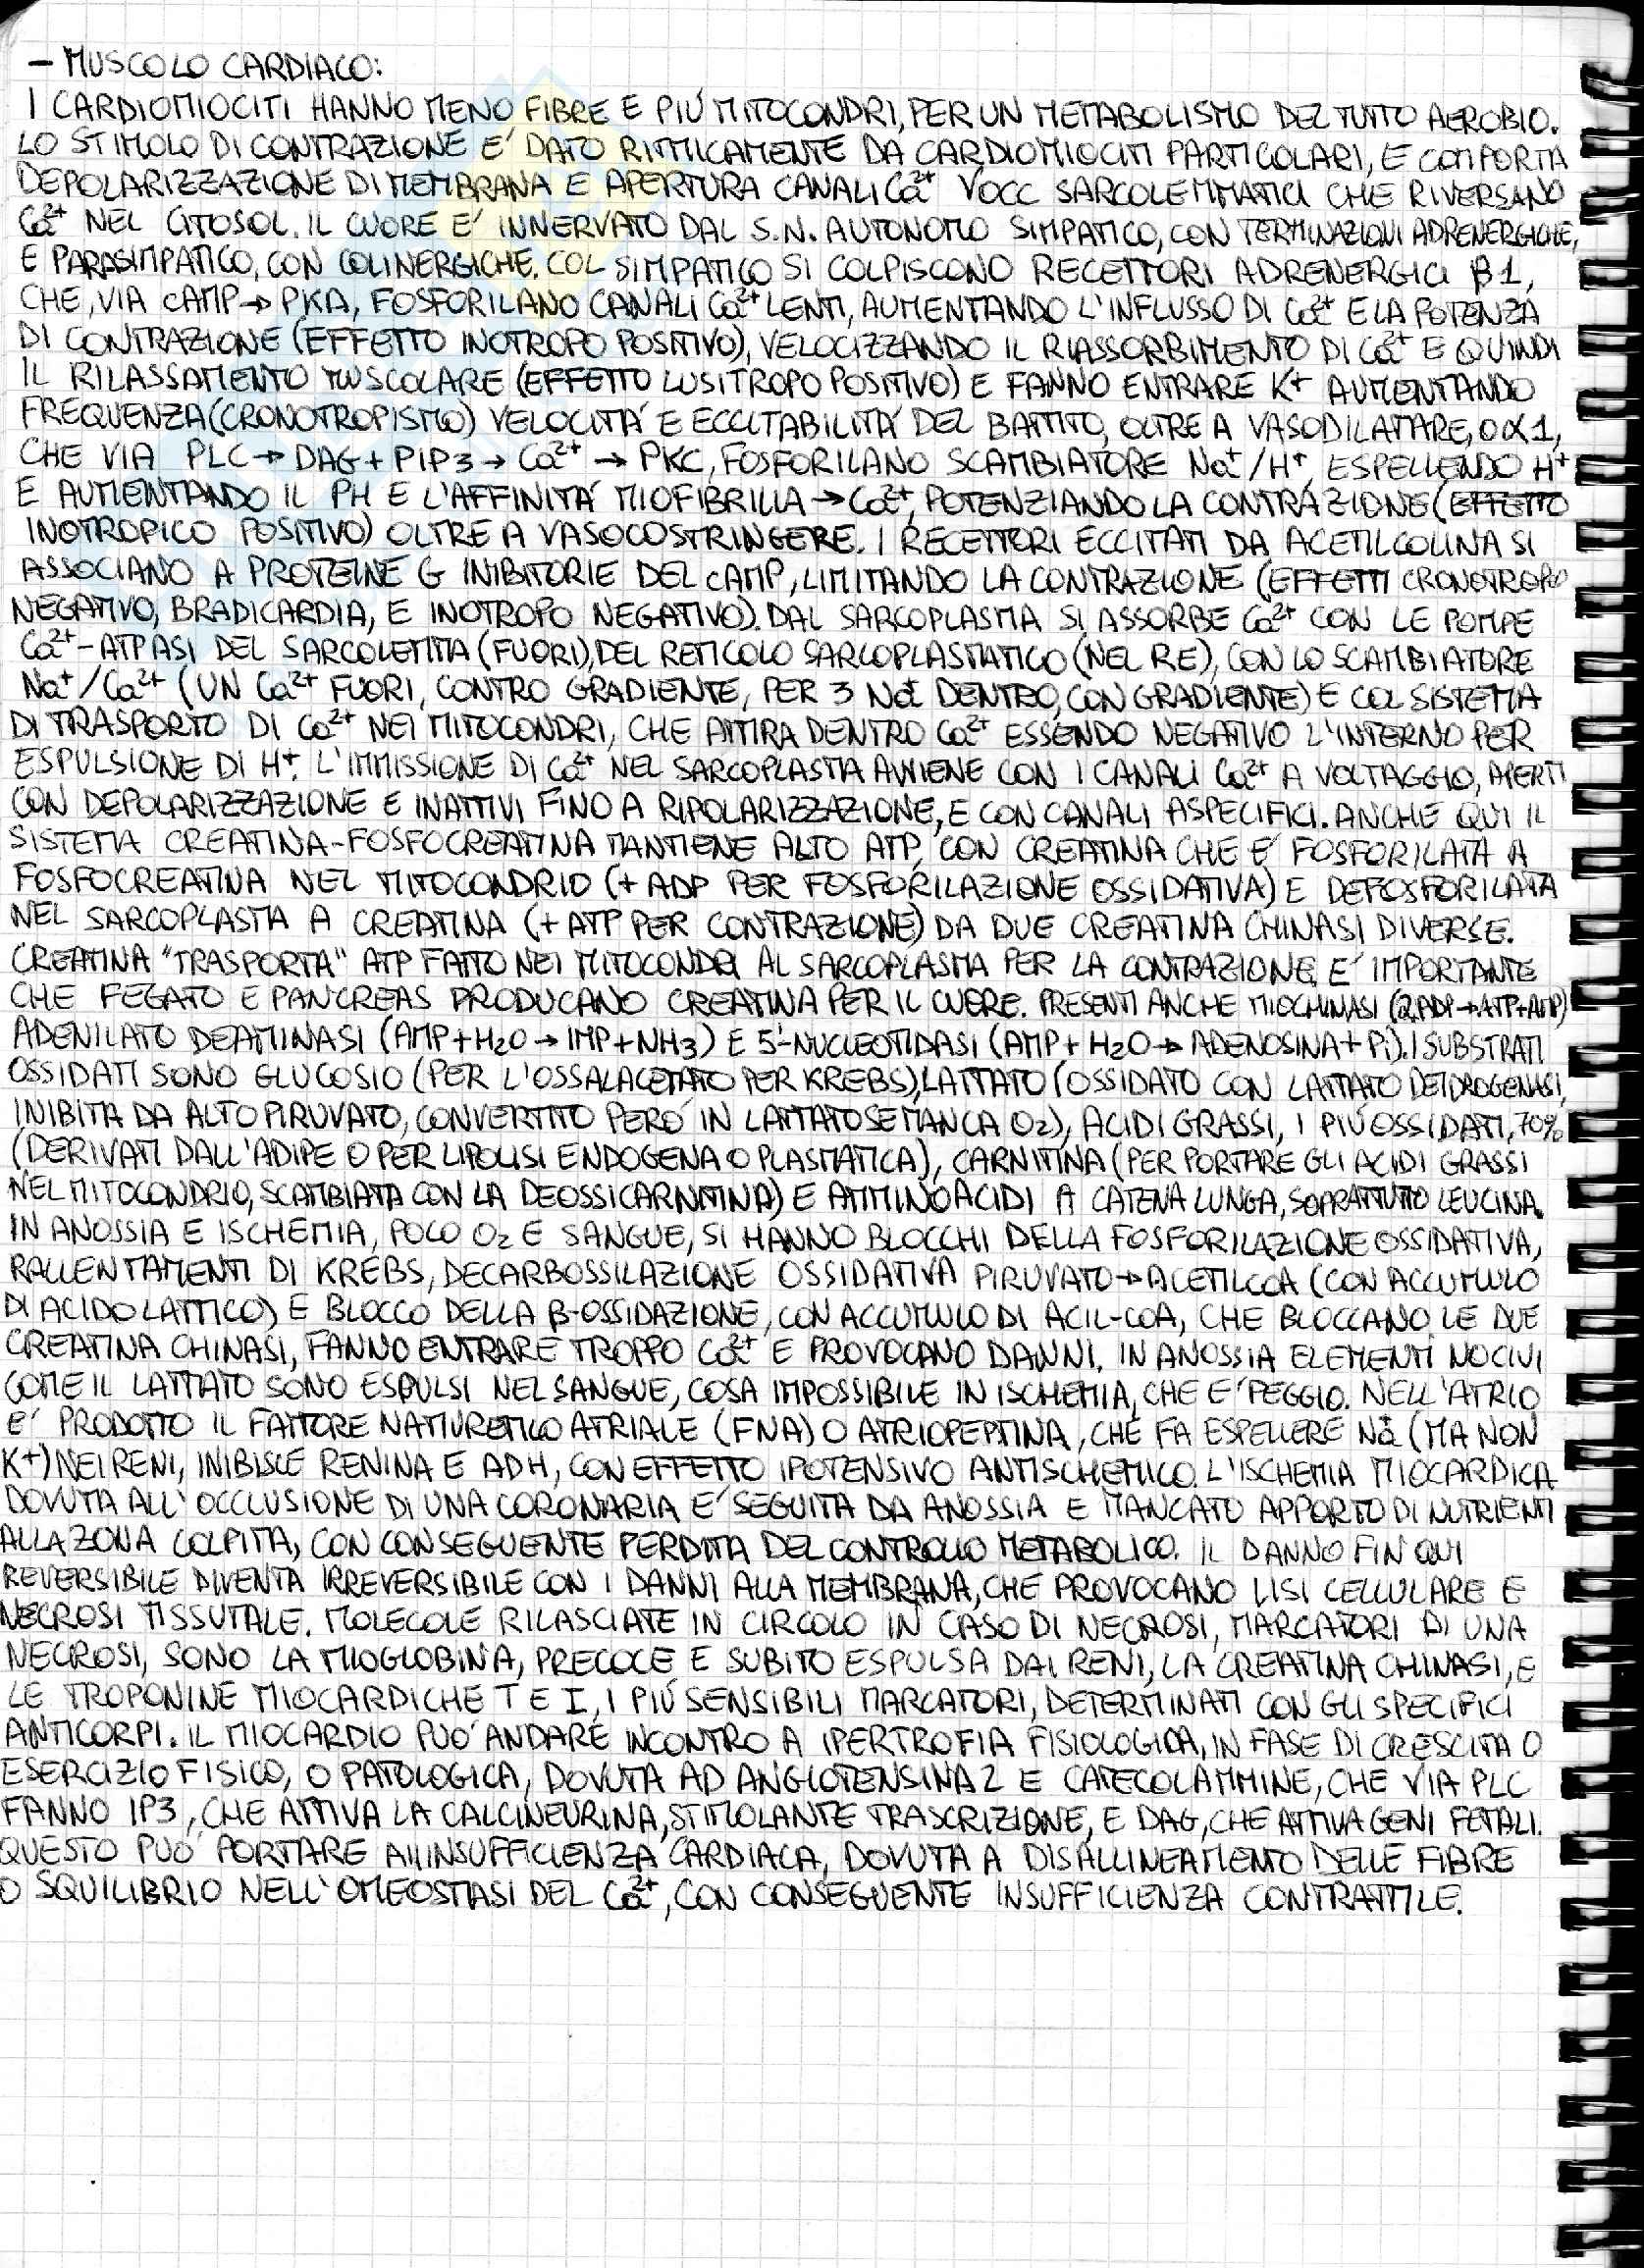 Riassunto esame Biochimica medica generale, prof. Chiarugi Pag. 31